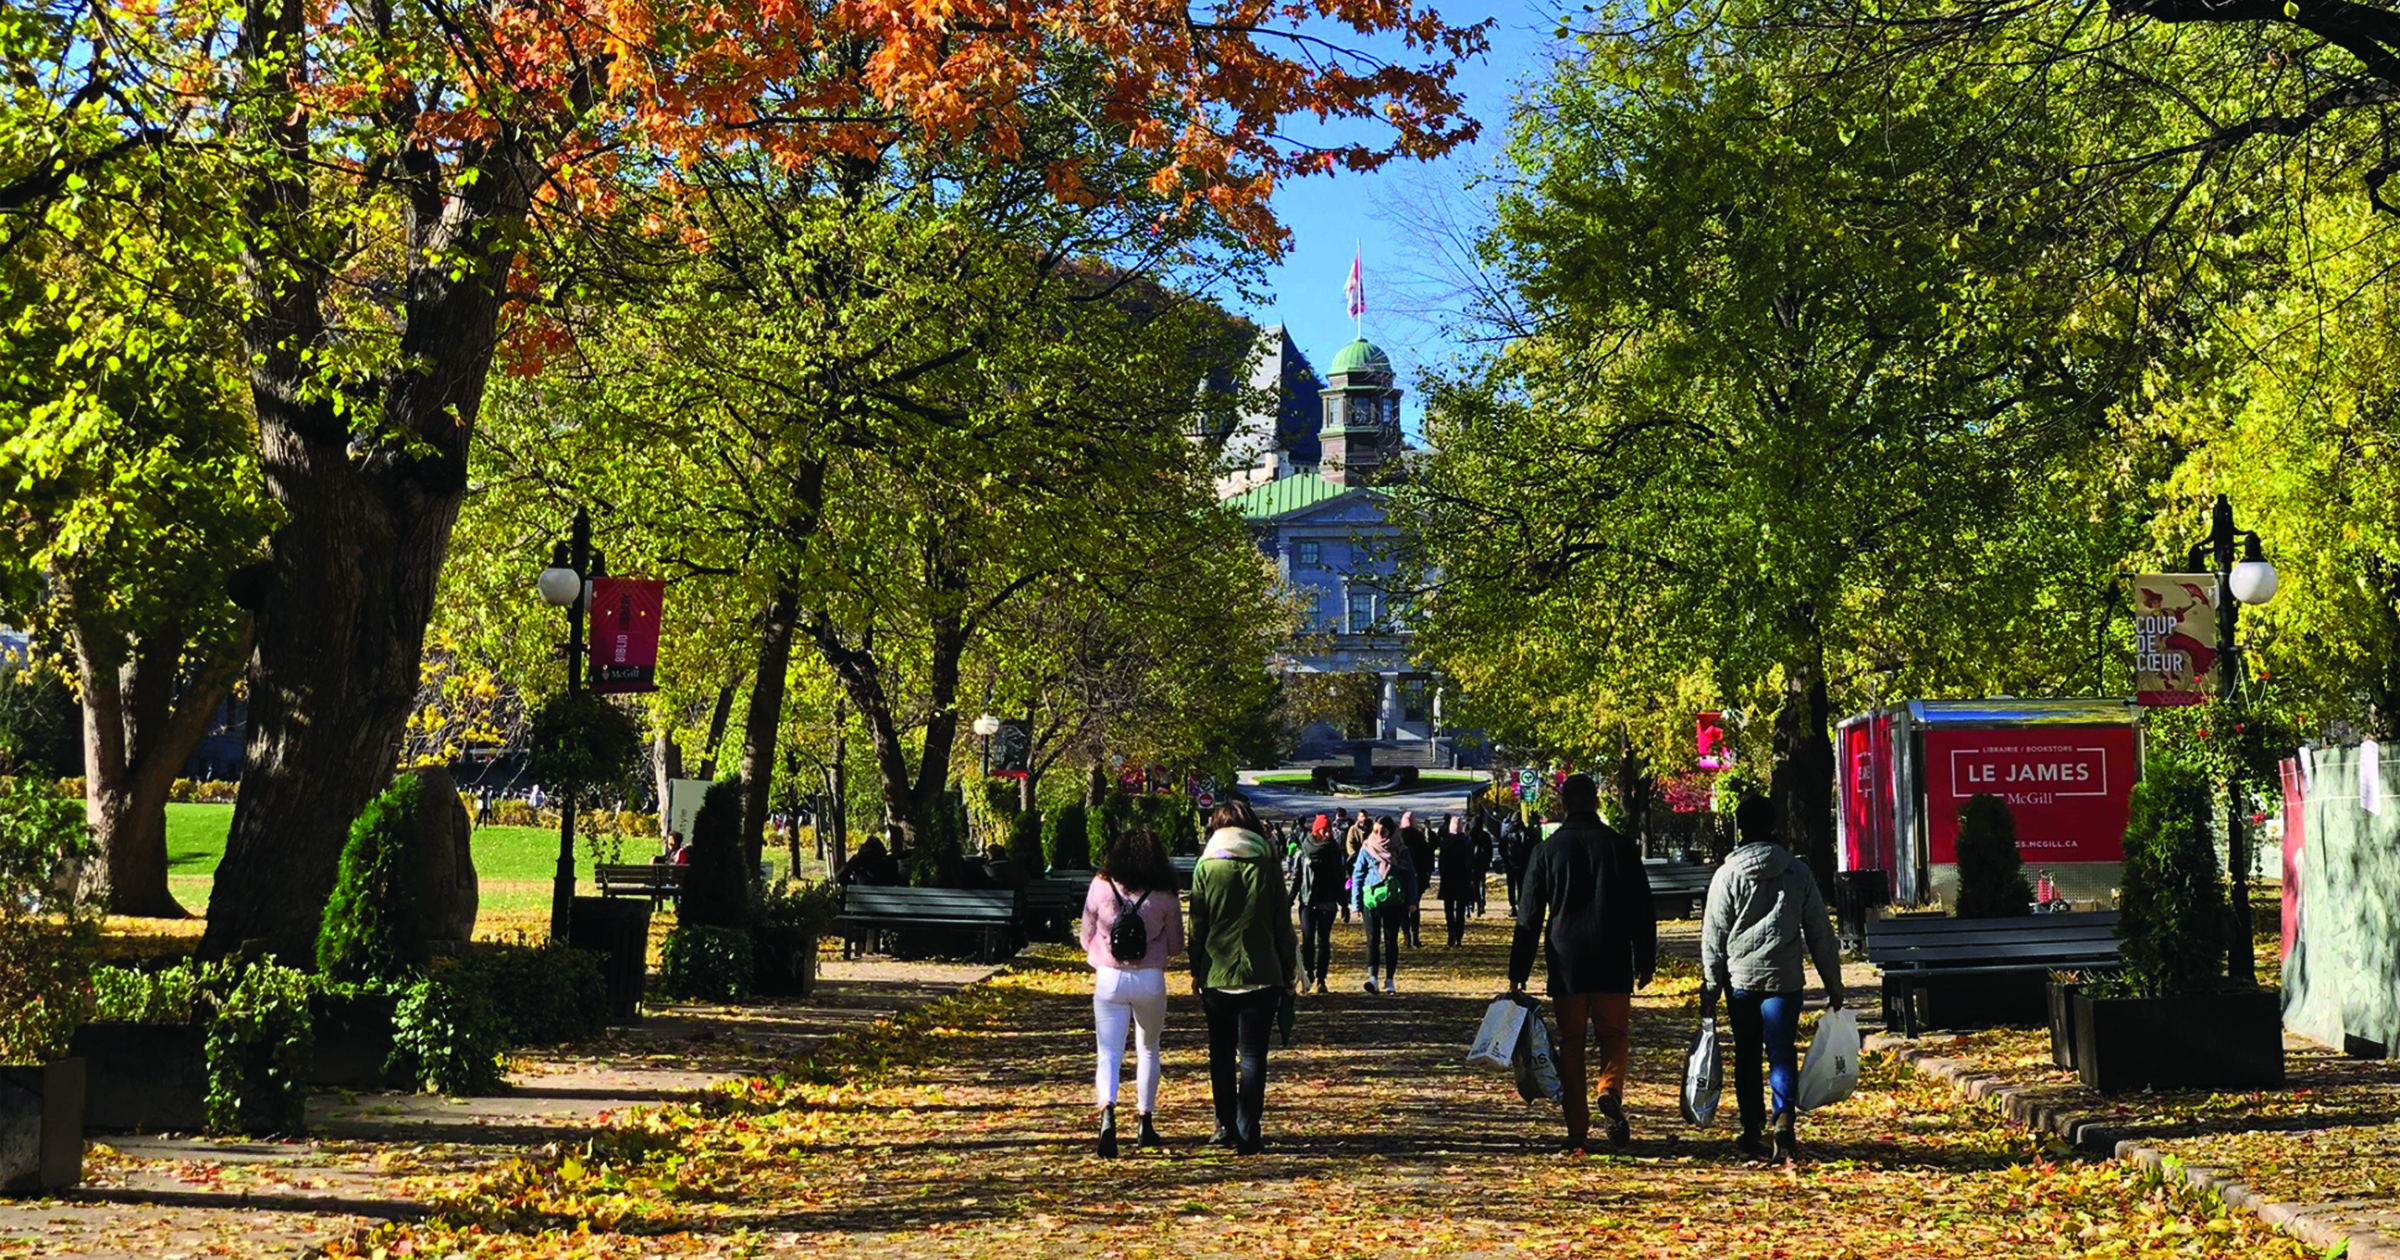 A Billionaire Starts a Retail Management School at McGill University